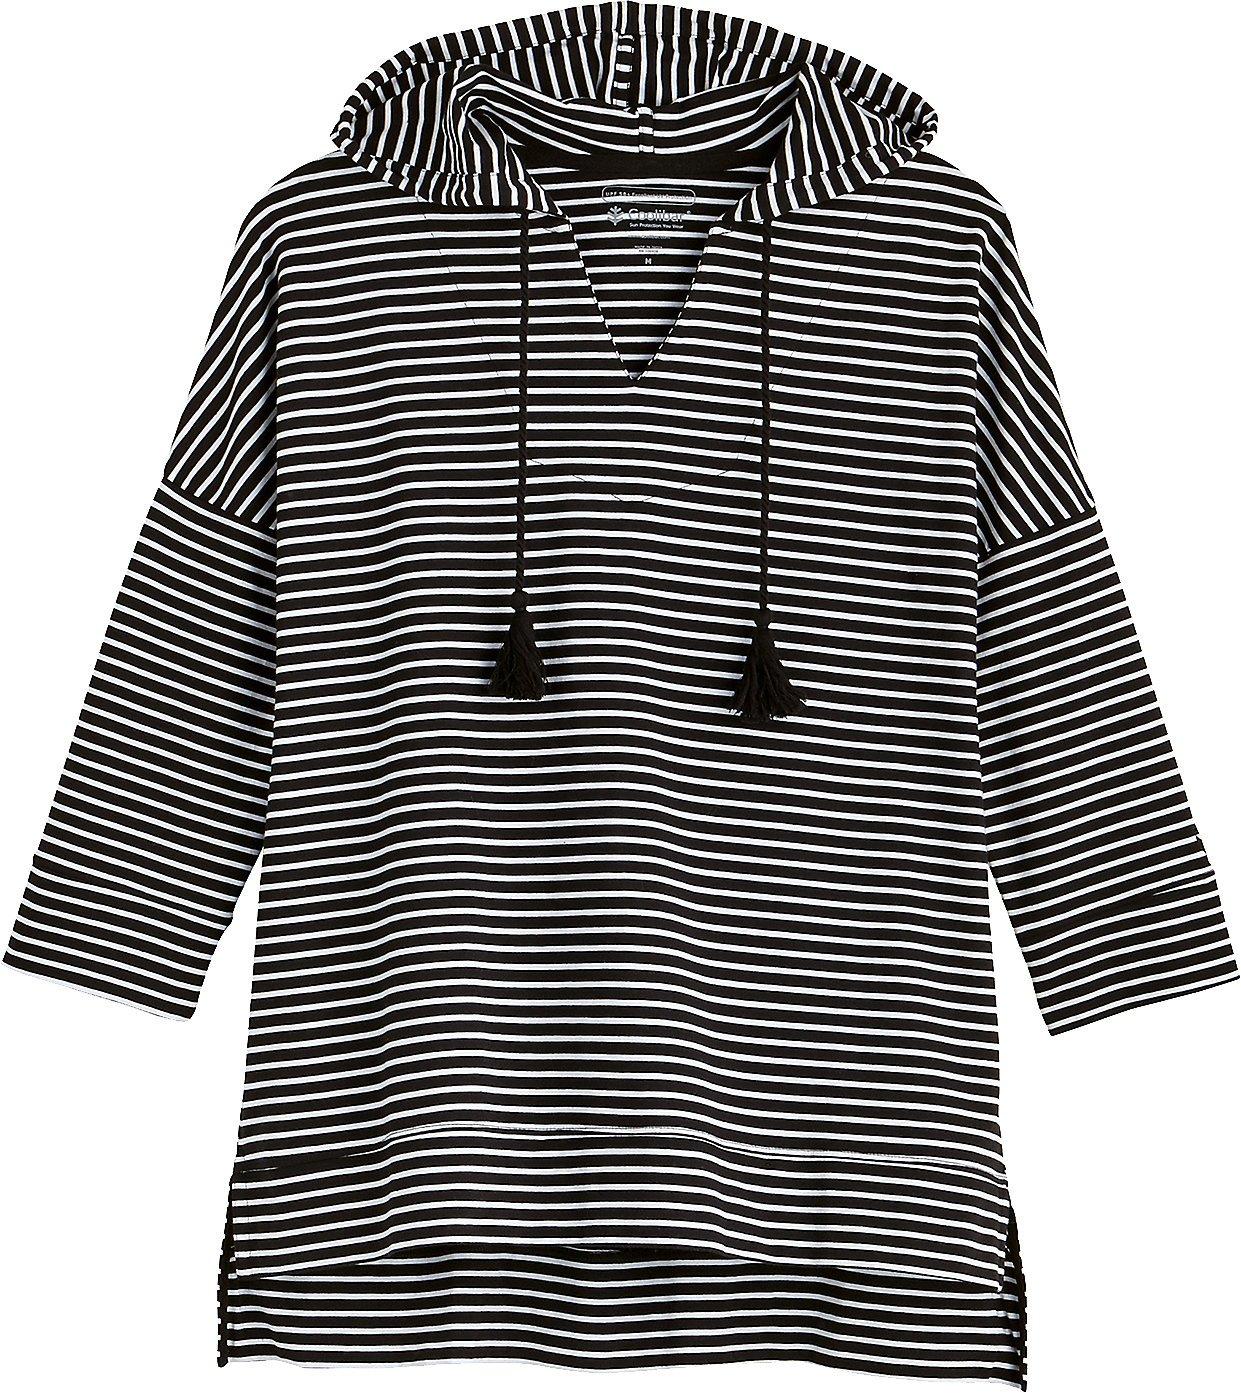 Coolibar UPF 50+ Women's Beach Hoodie - Sun Protective (X-Small- Fine Black/White Stripe) by Coolibar (Image #2)